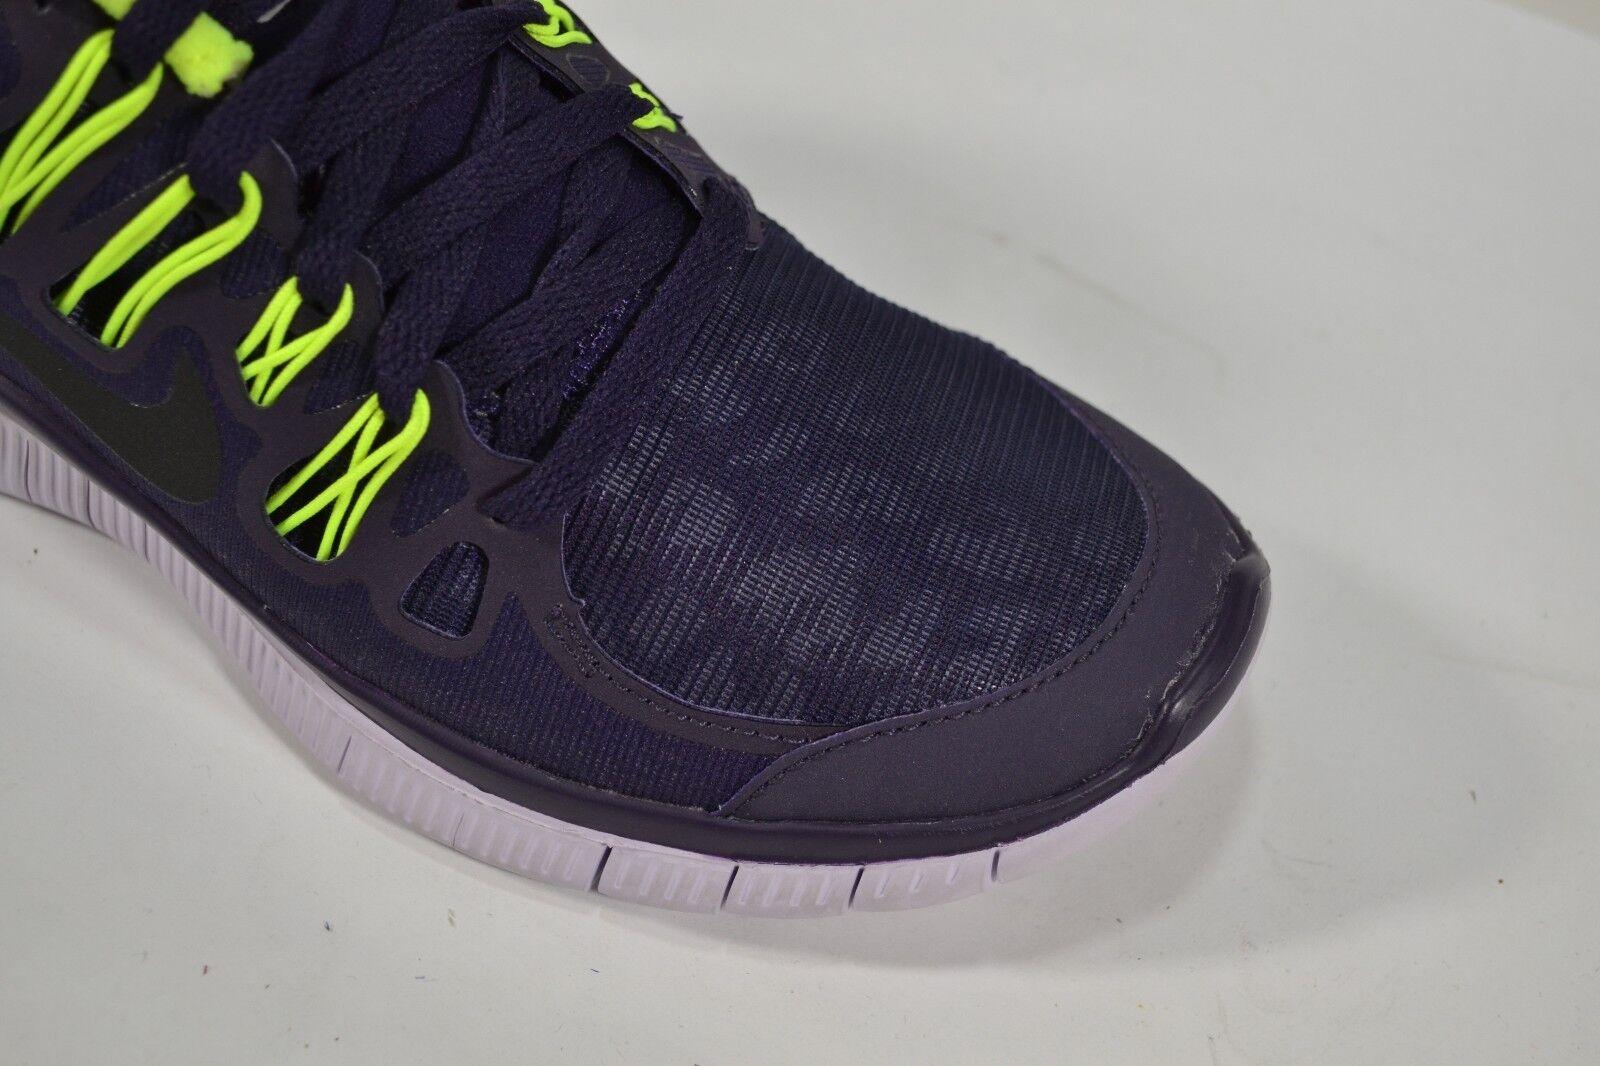 Nike FREE 5.0+ SHIELD Purple Dynasty Black Volt Cheetah Cheetah Cheetah (342) Women's shoes 3b0eb1